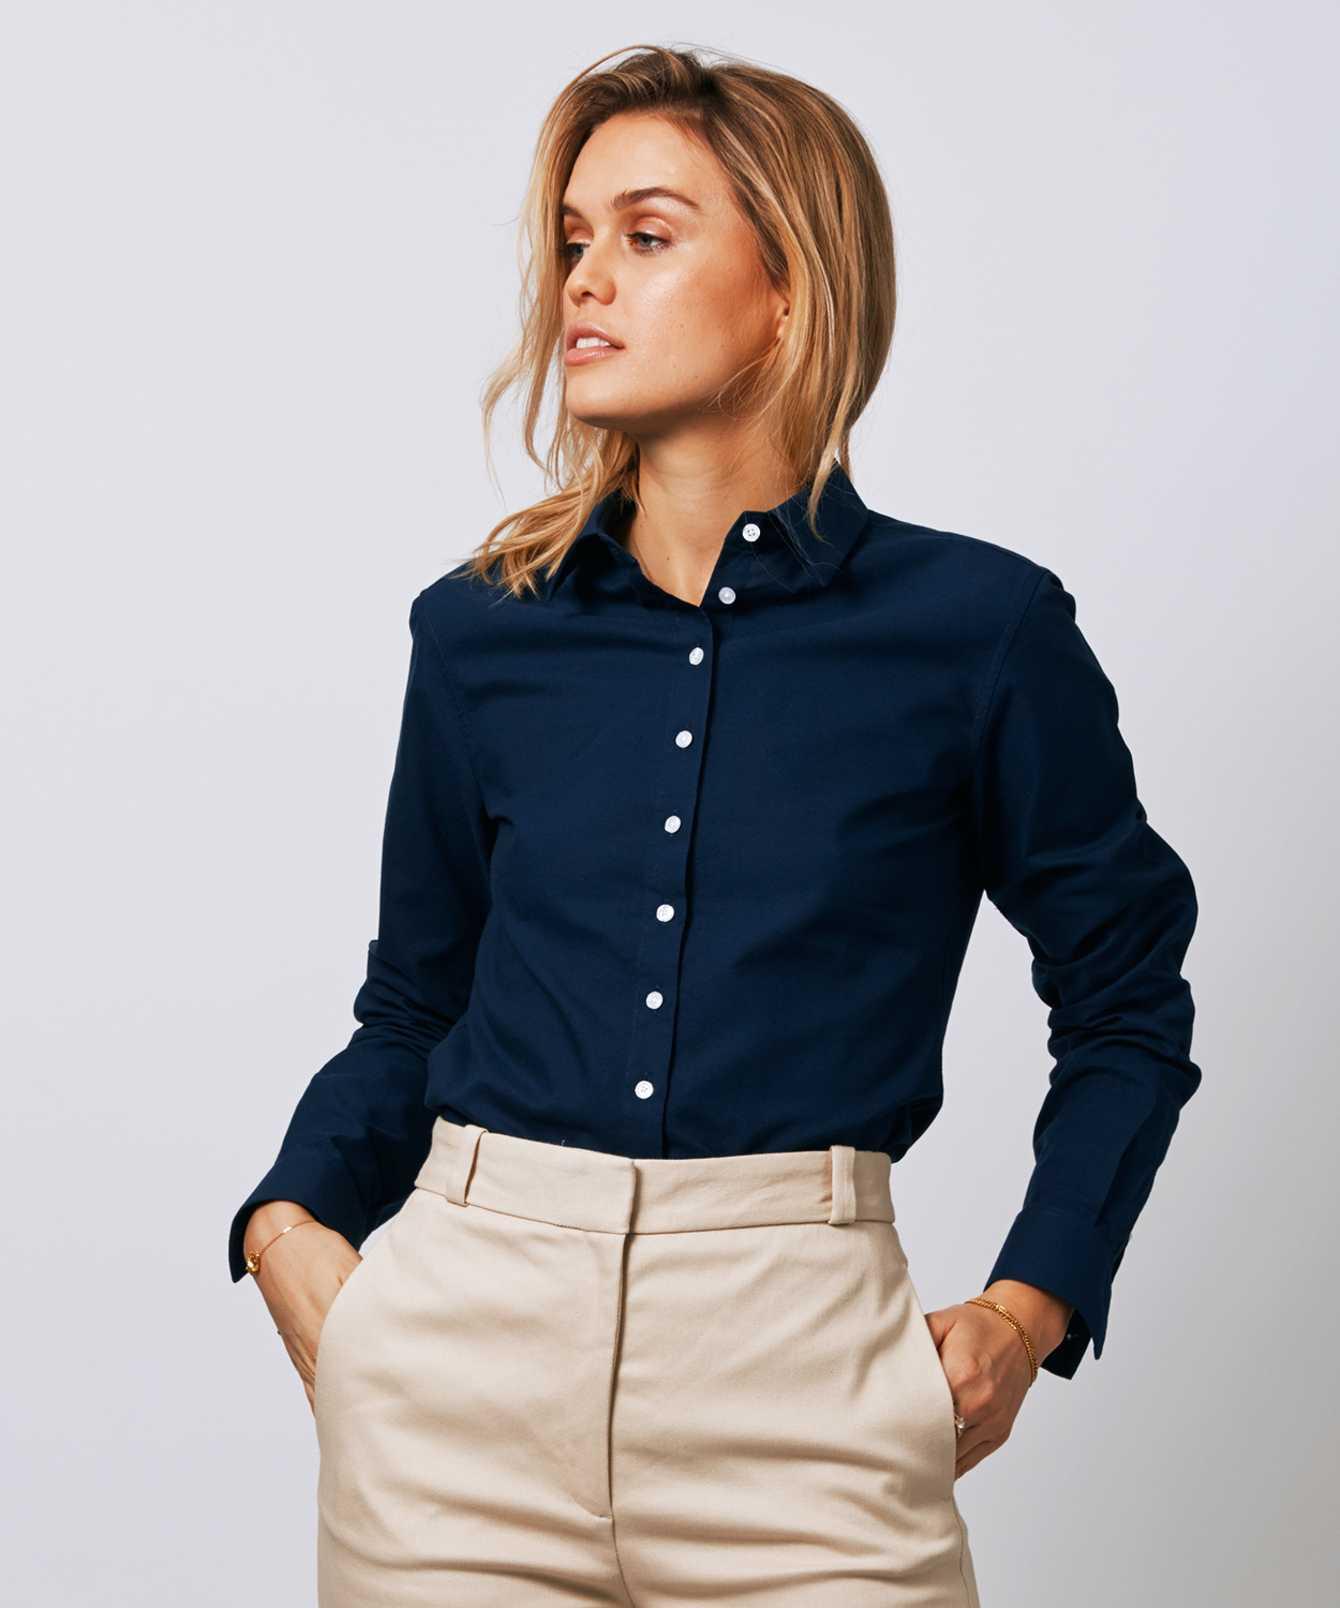 Skjorta Tilde Hampton Oxford Navy The Shirt Factory